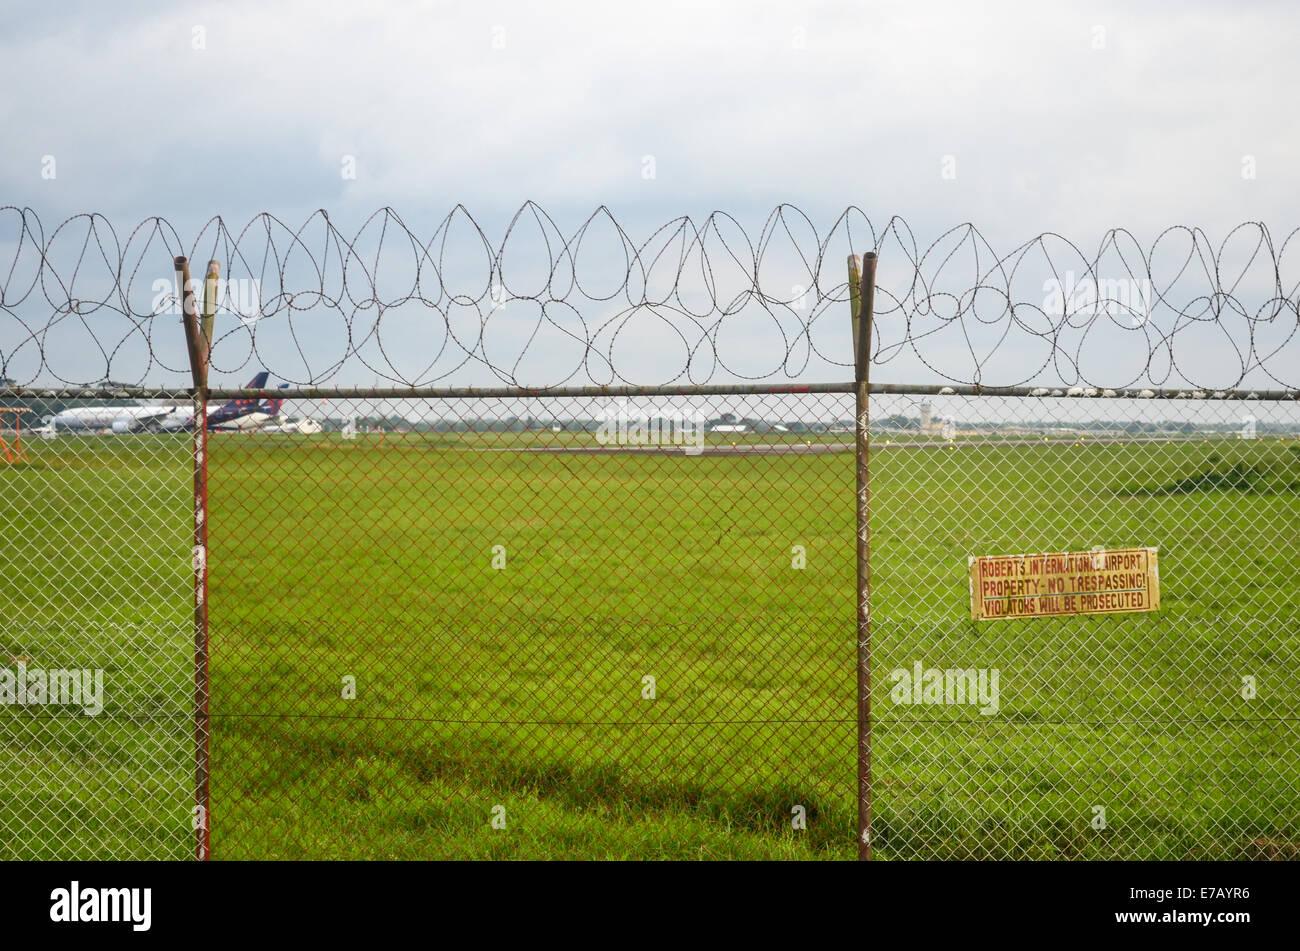 Roberts International Airport, Monrovia, Liberia - Stock Image